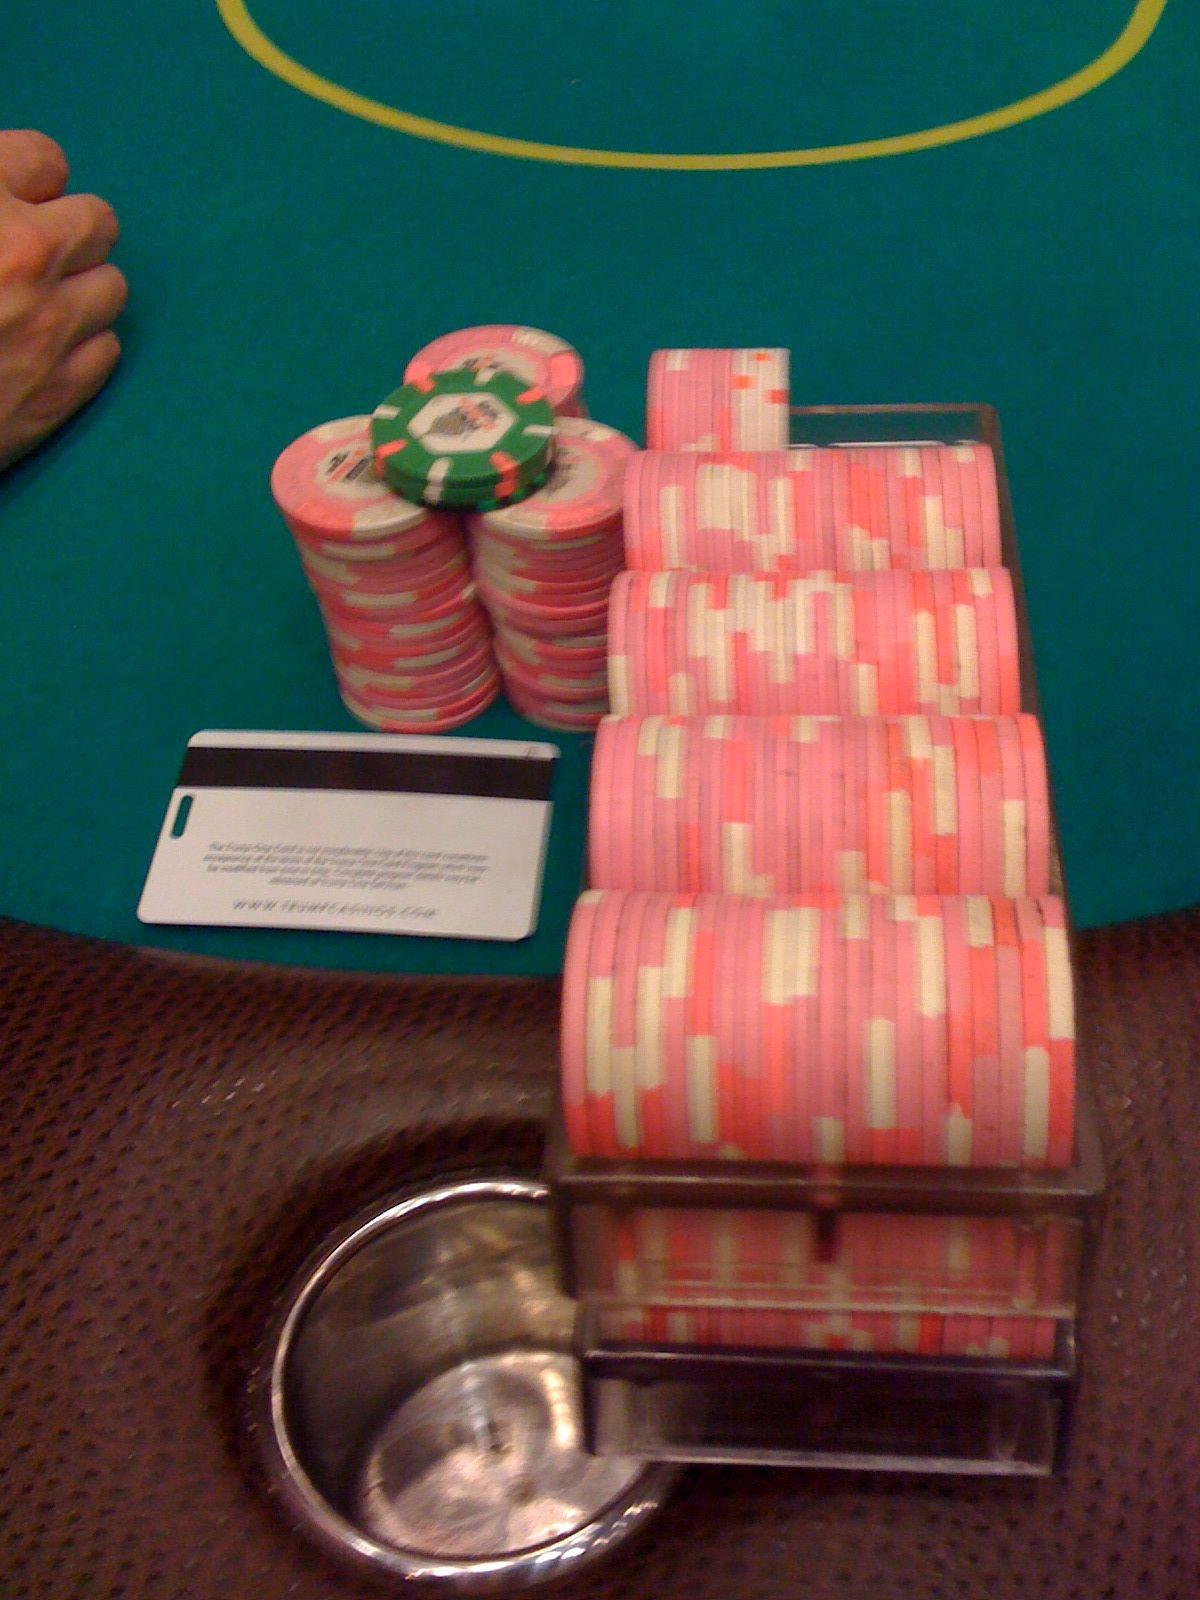 Pink Chip Game at